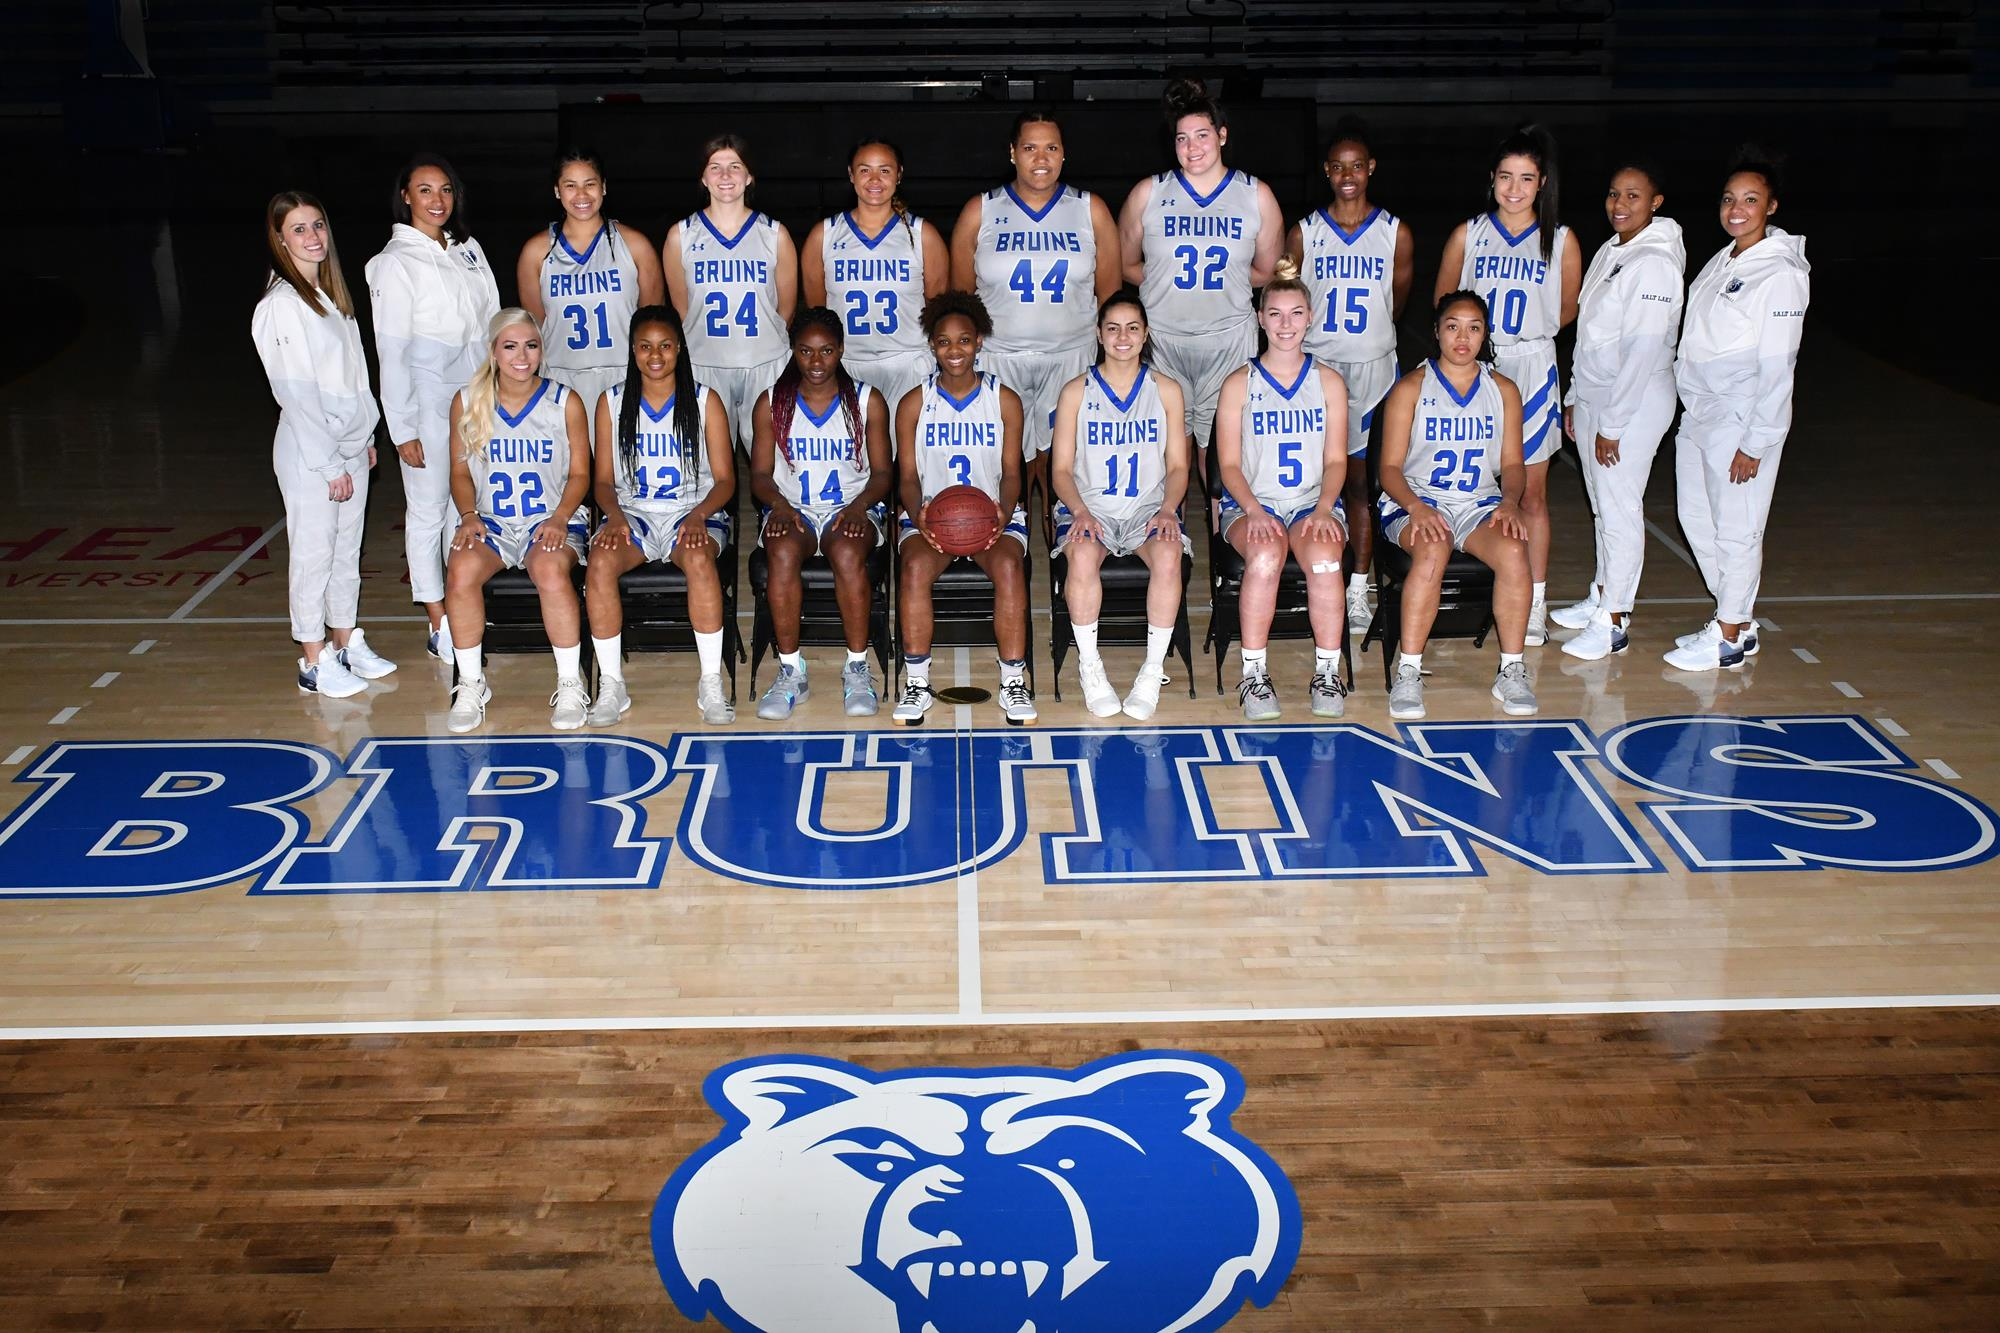 2019-20 women's basketball team photo